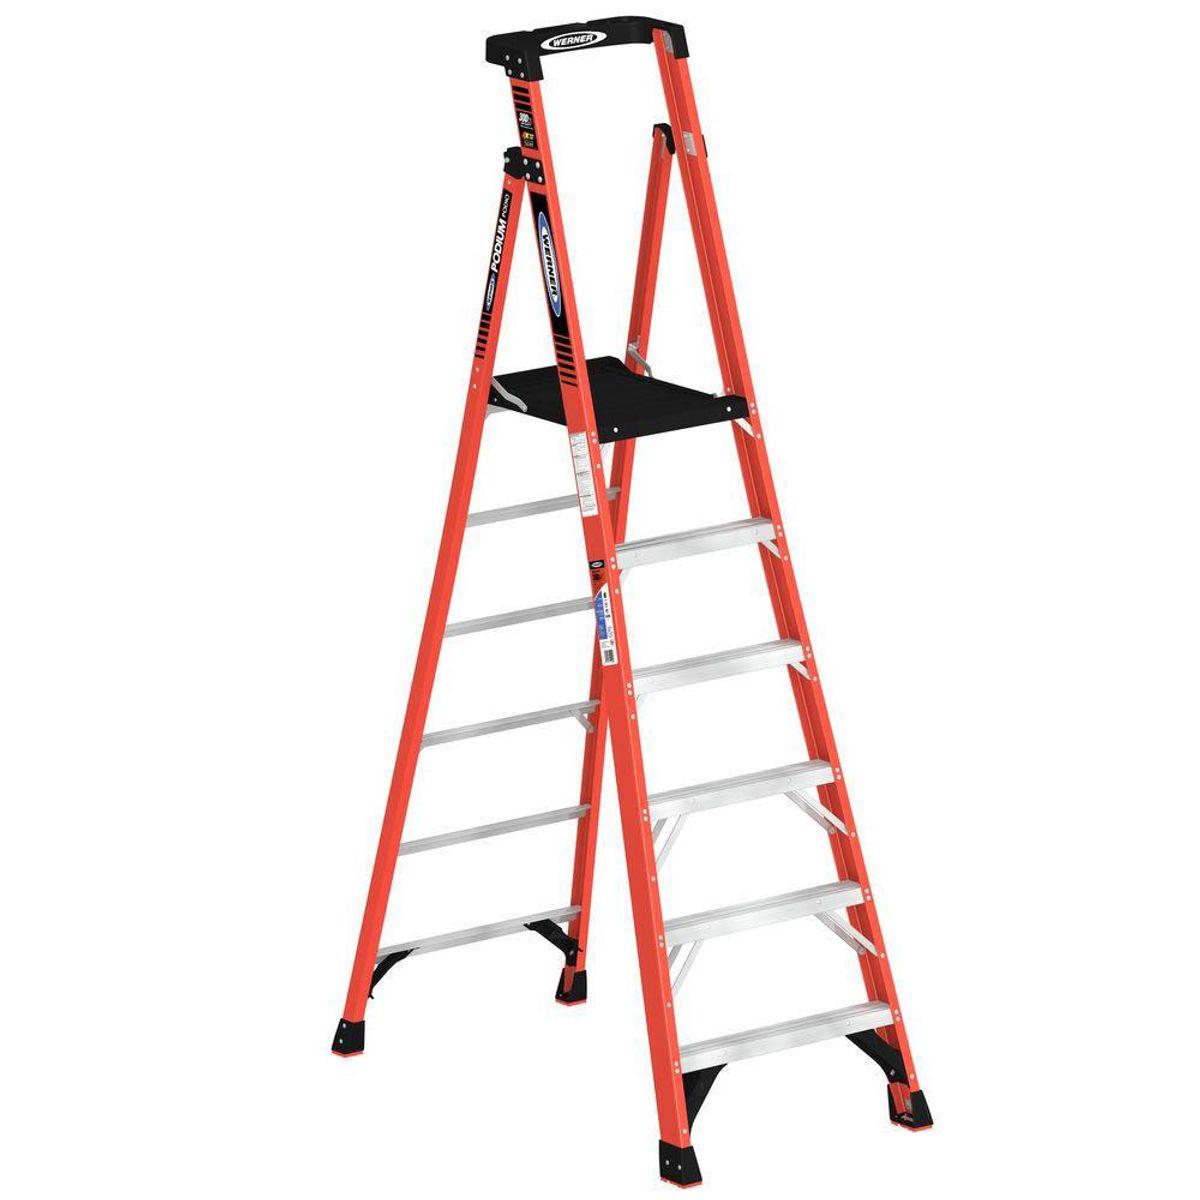 Phenomenal Pdia06 Step Ladders Werner Us Creativecarmelina Interior Chair Design Creativecarmelinacom